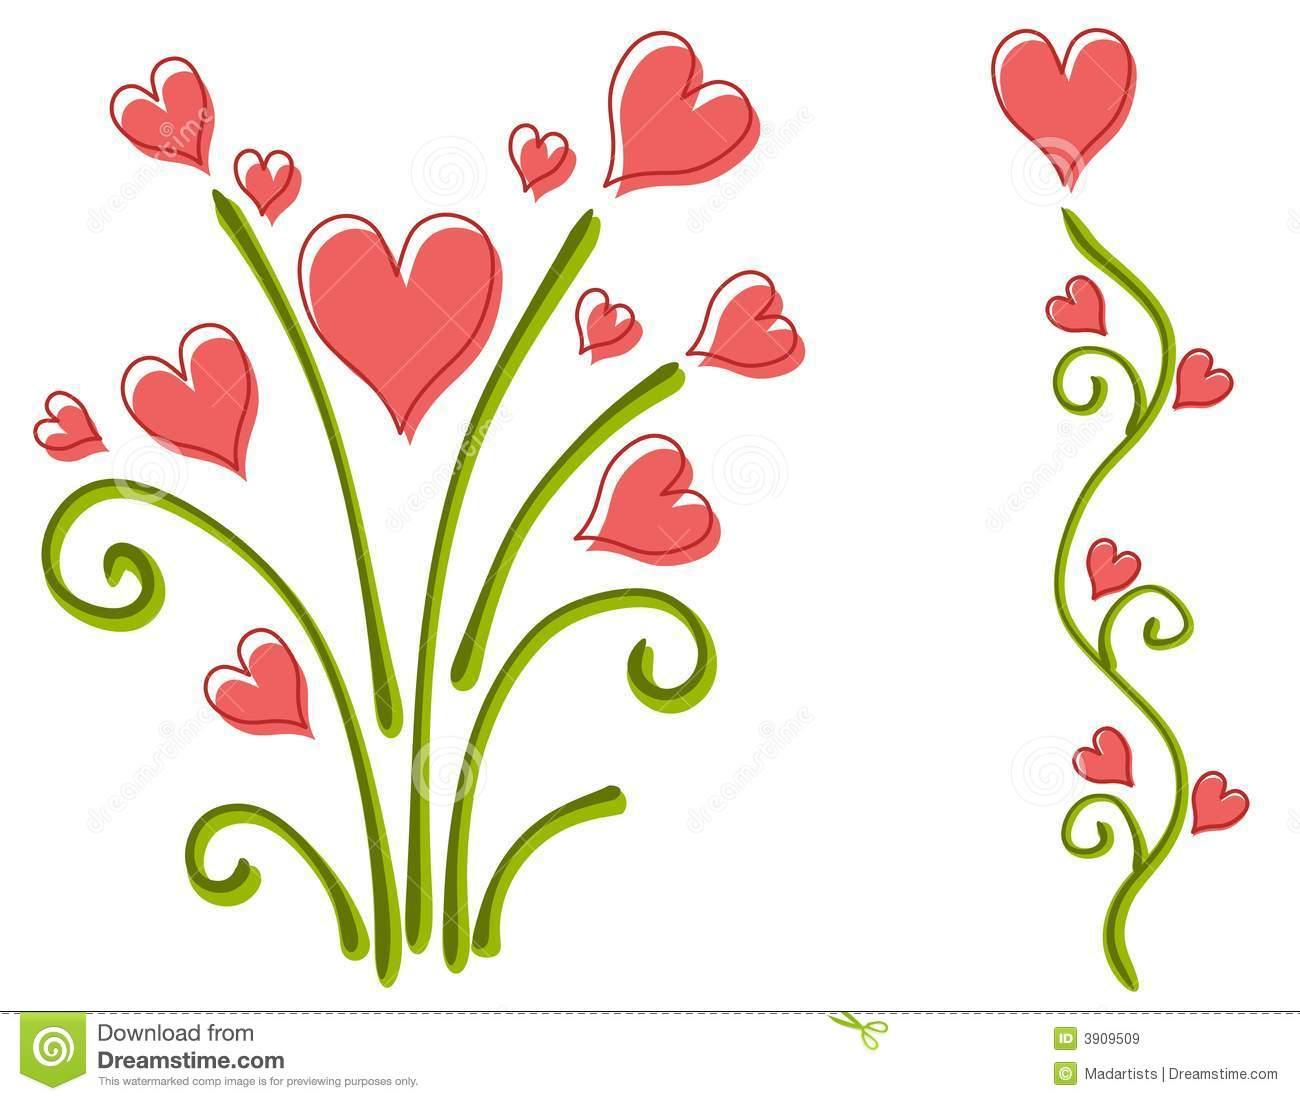 Valentine Heart and Flower Clip Art